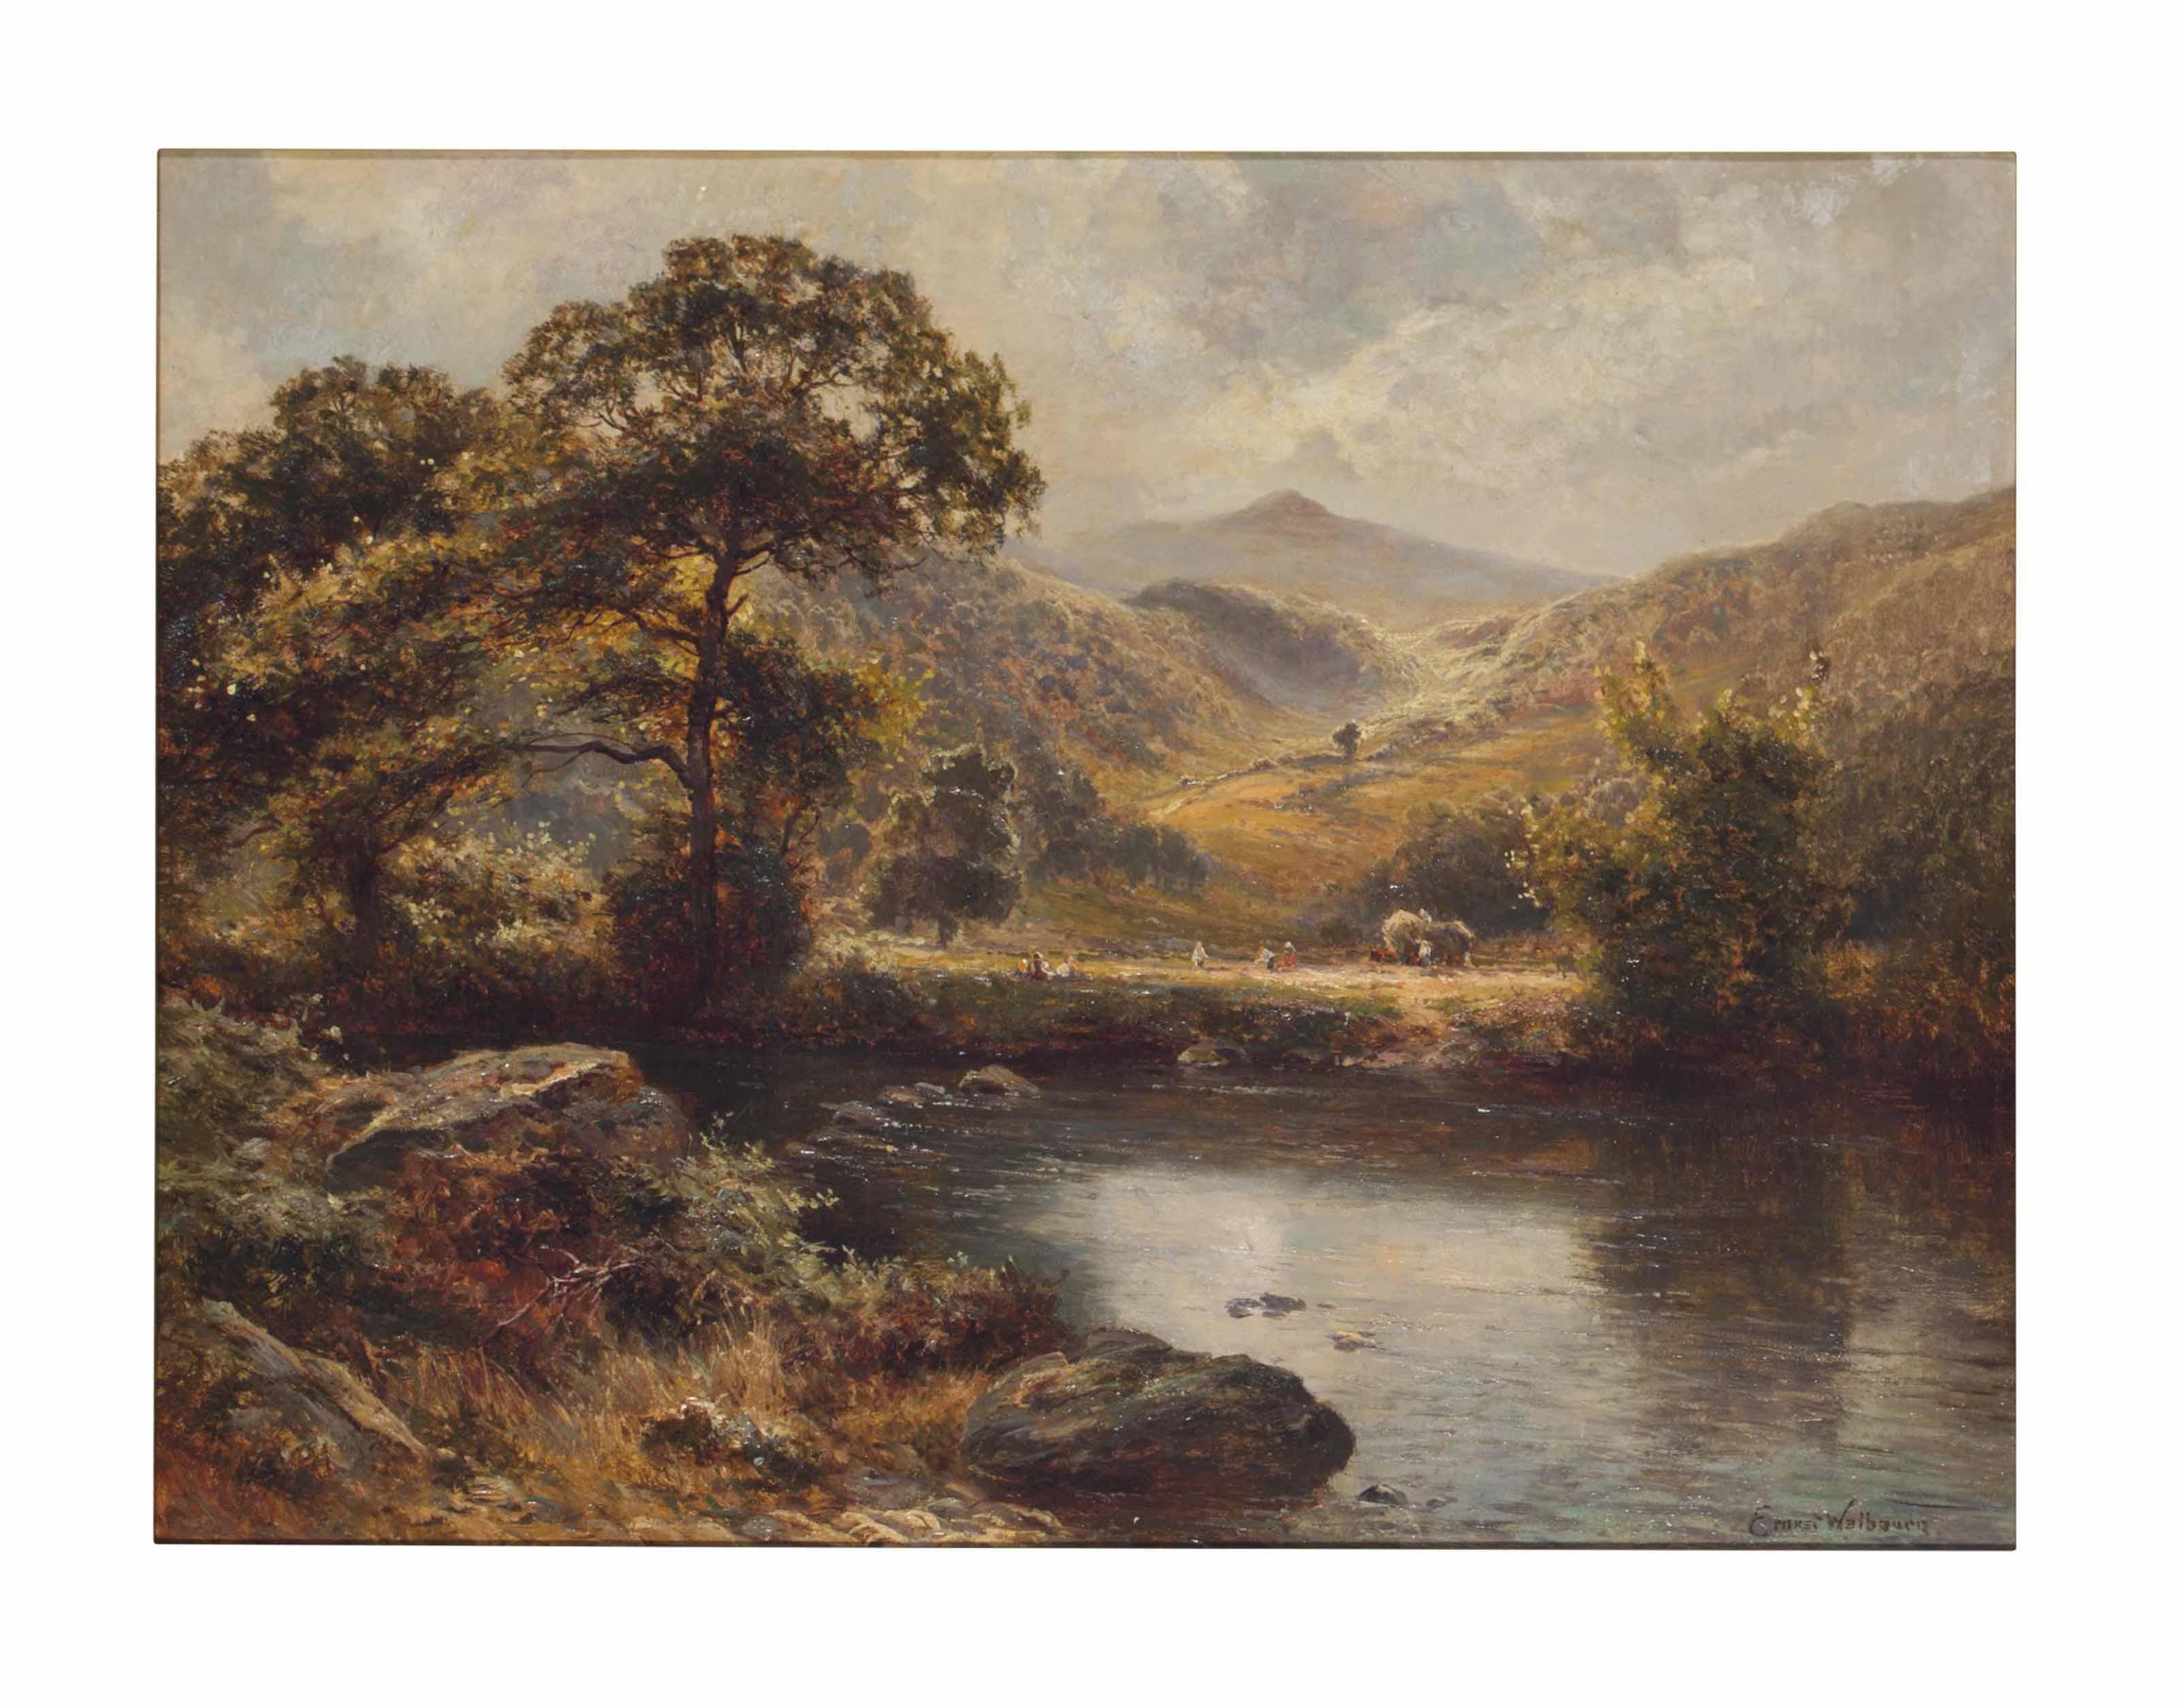 Figures alongside a lake in a mountainous landscape